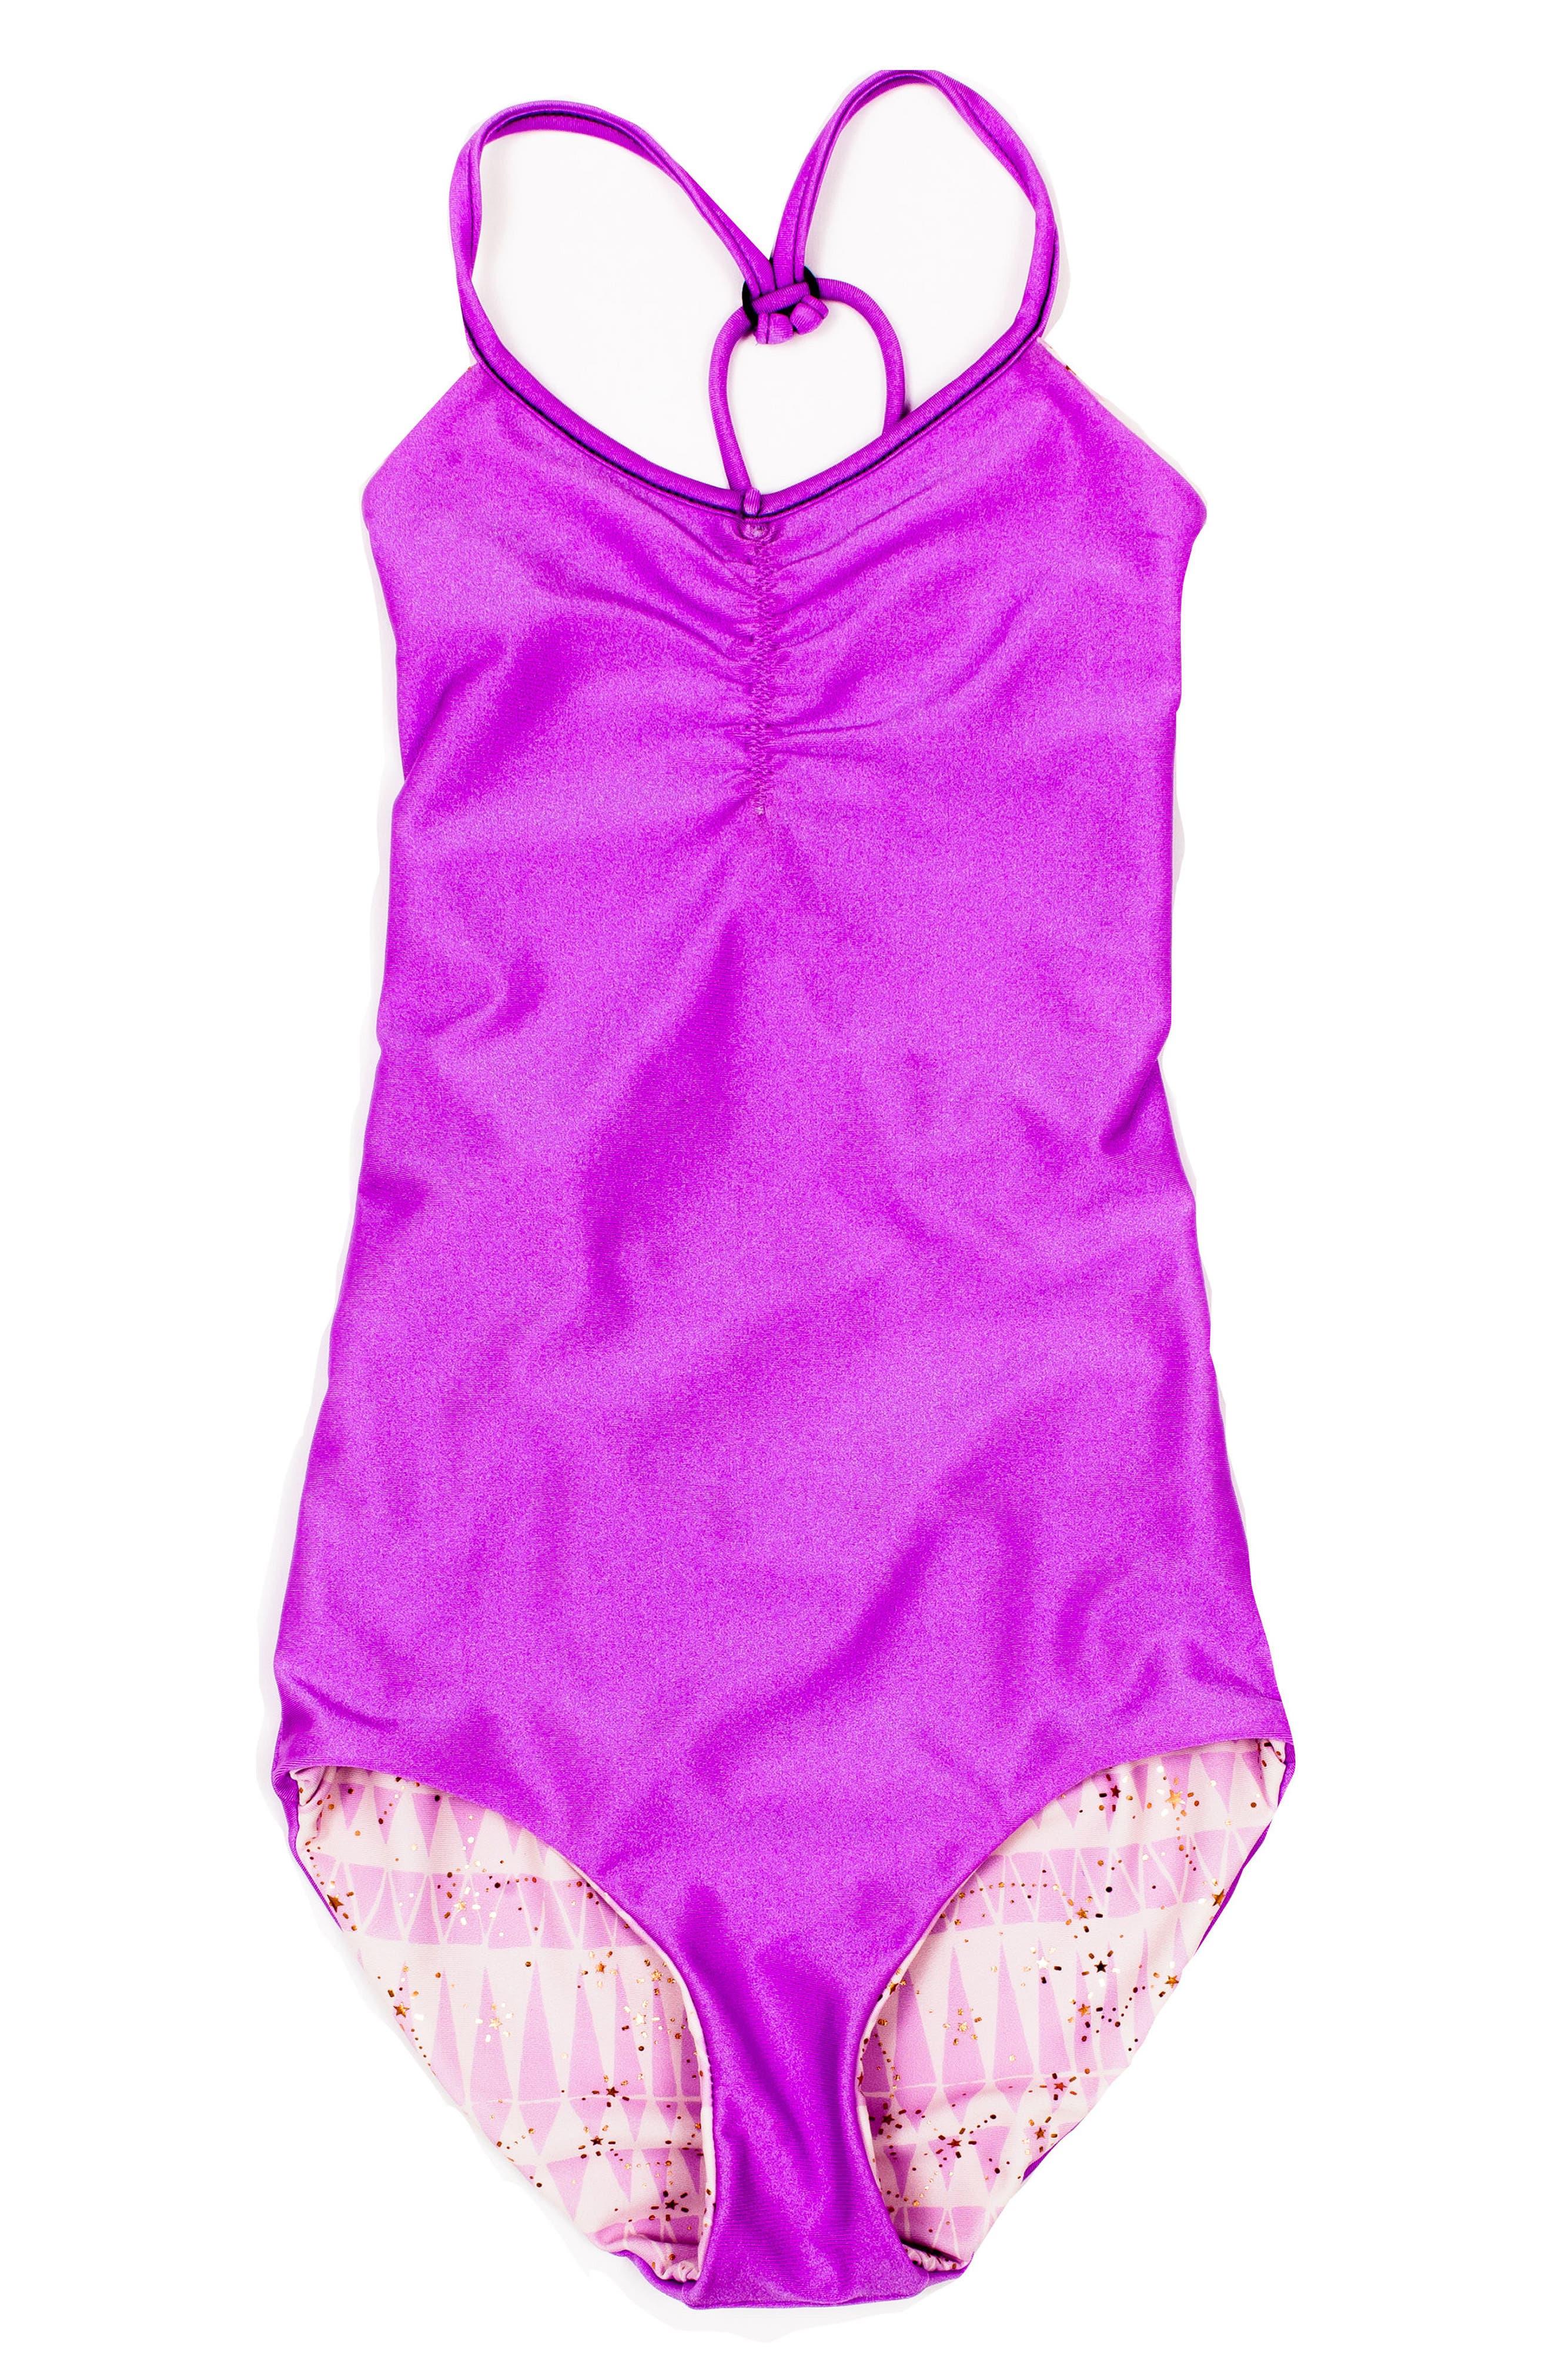 Catalinakini One-Piece Reversible Swimsuit,                             Alternate thumbnail 2, color,                             Lavender